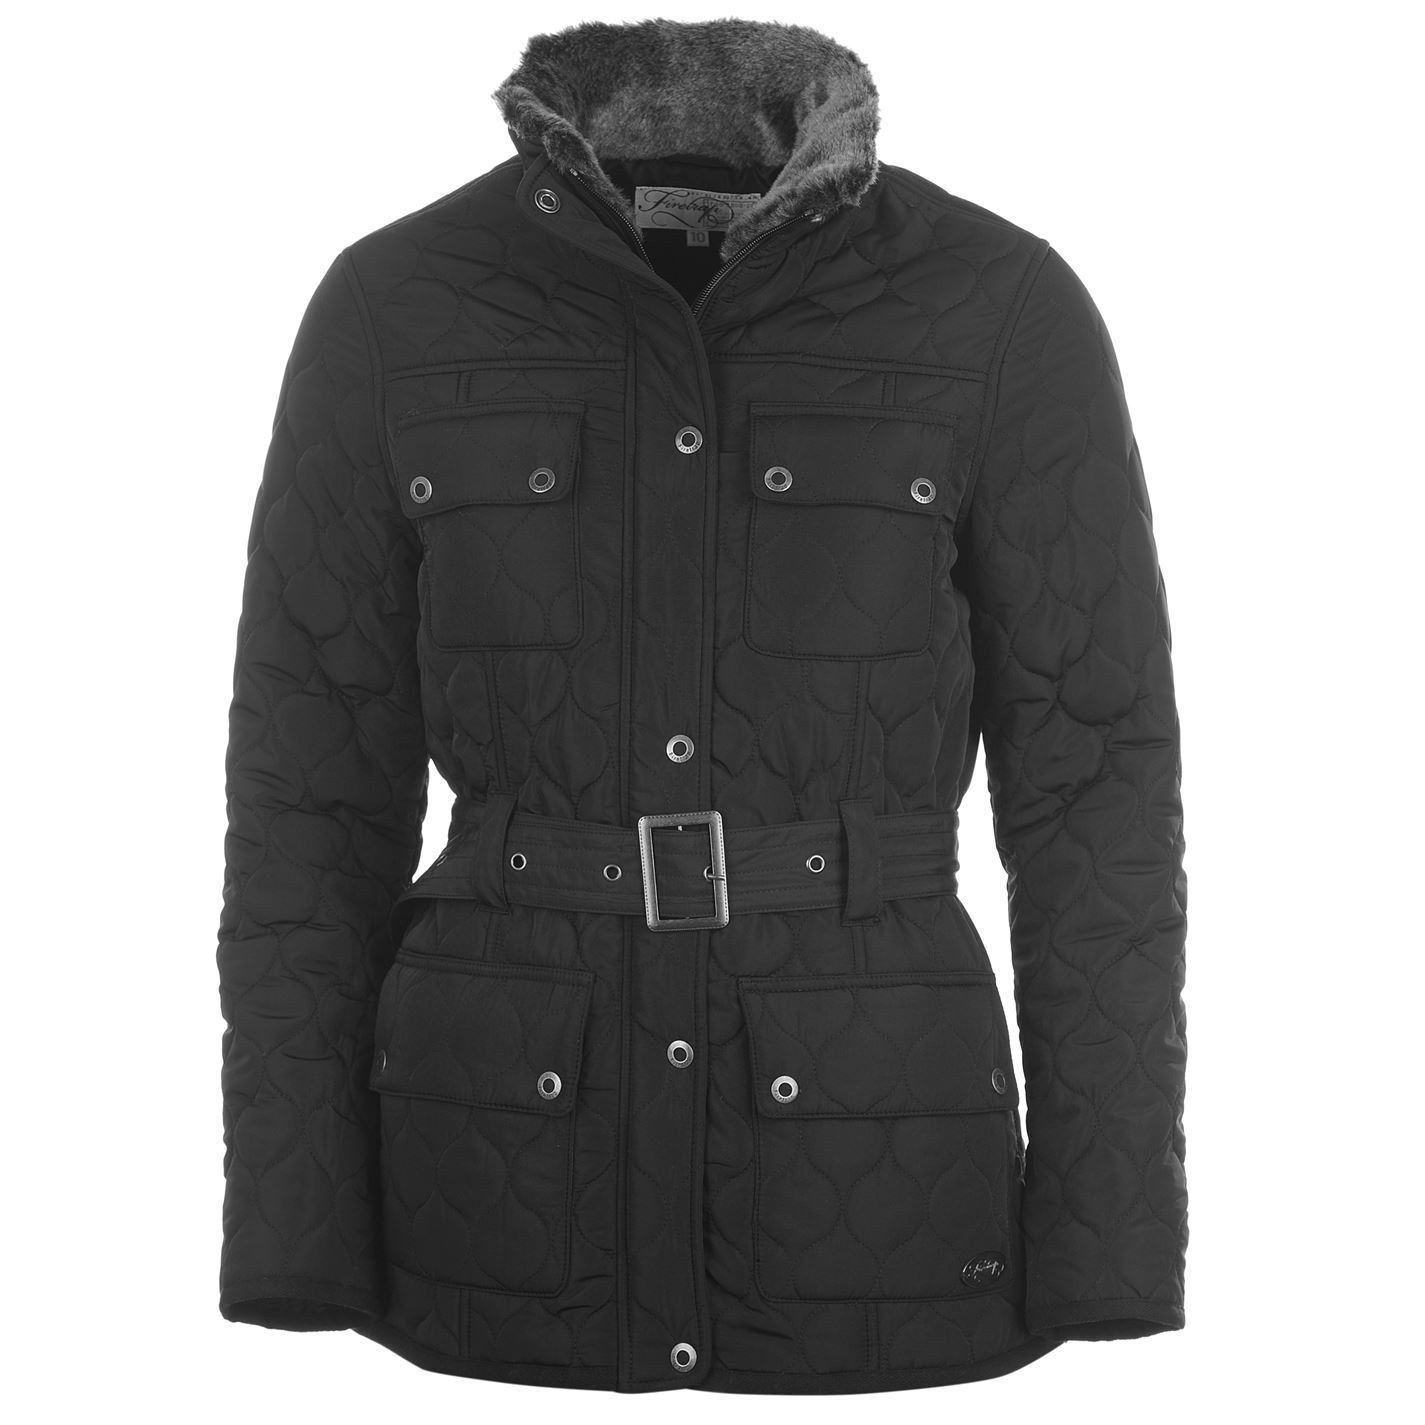 Firetrap womens jackets